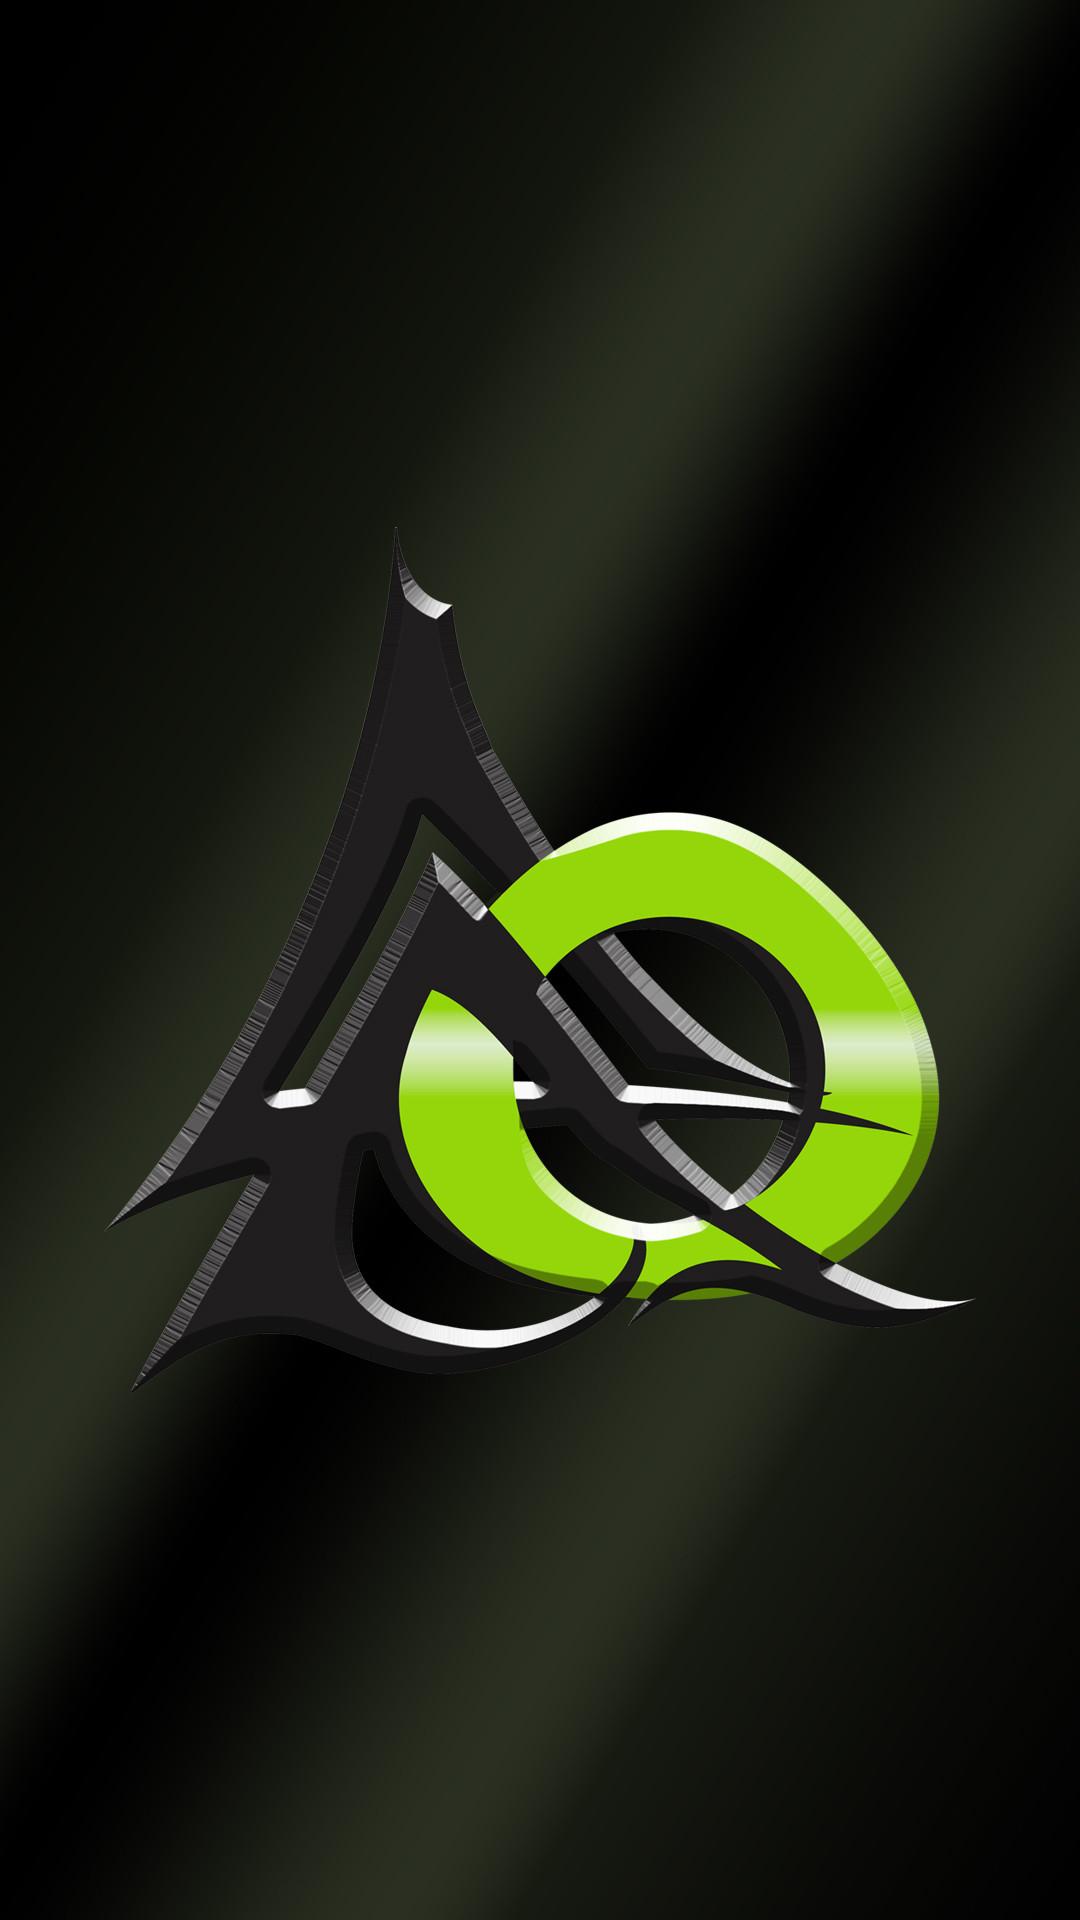 Res: 1080x1920, ODIN Works Logo wallpaper